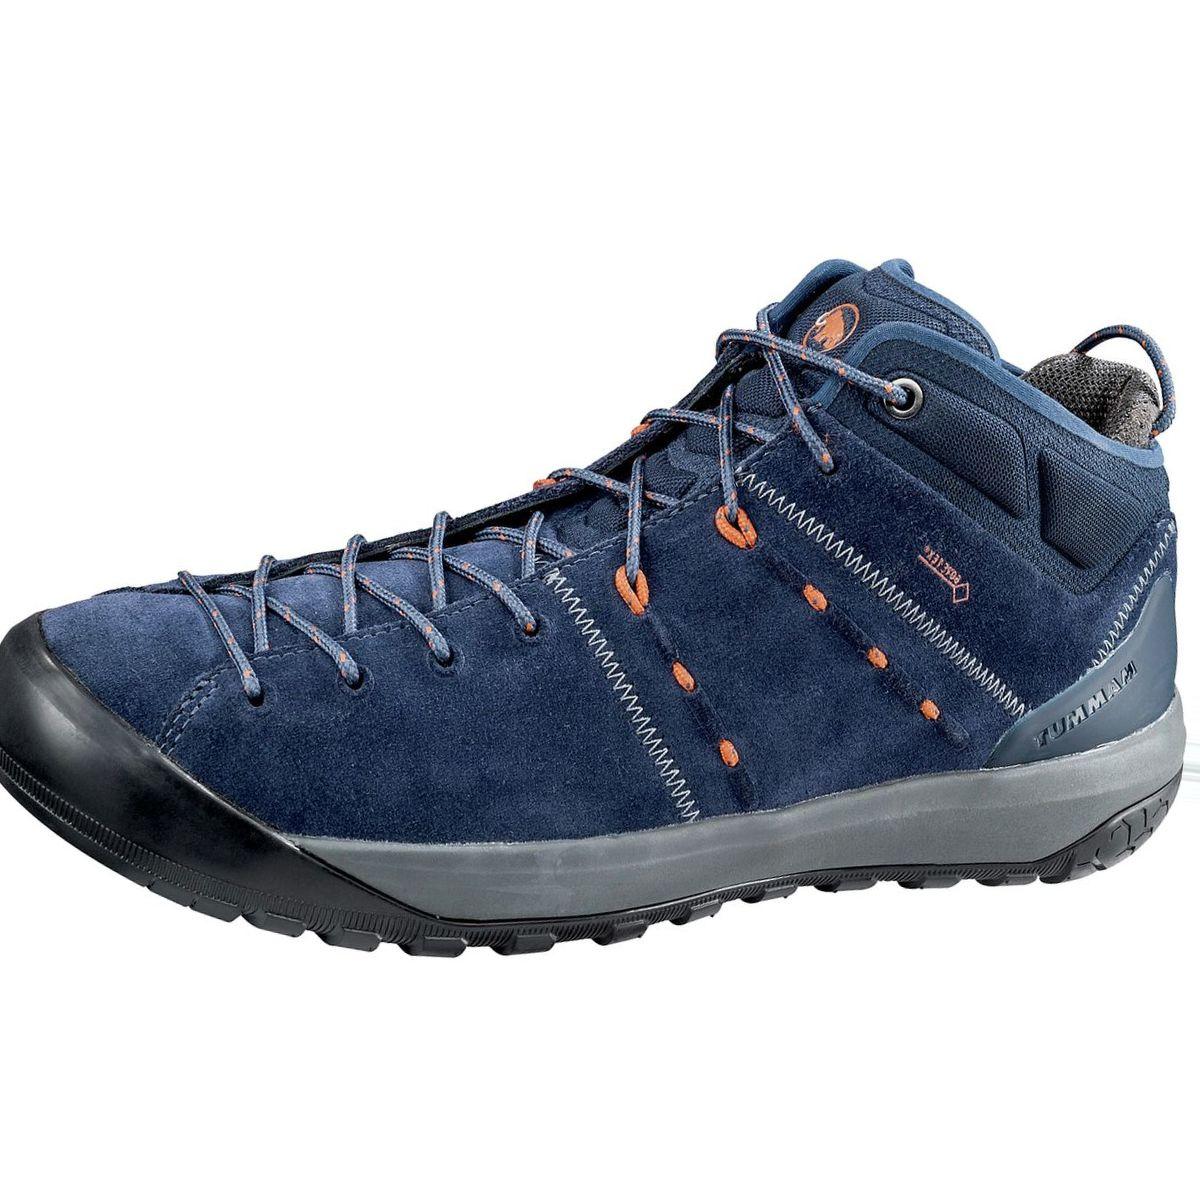 Mammut Hueco Mid GTX Shoe - Men's